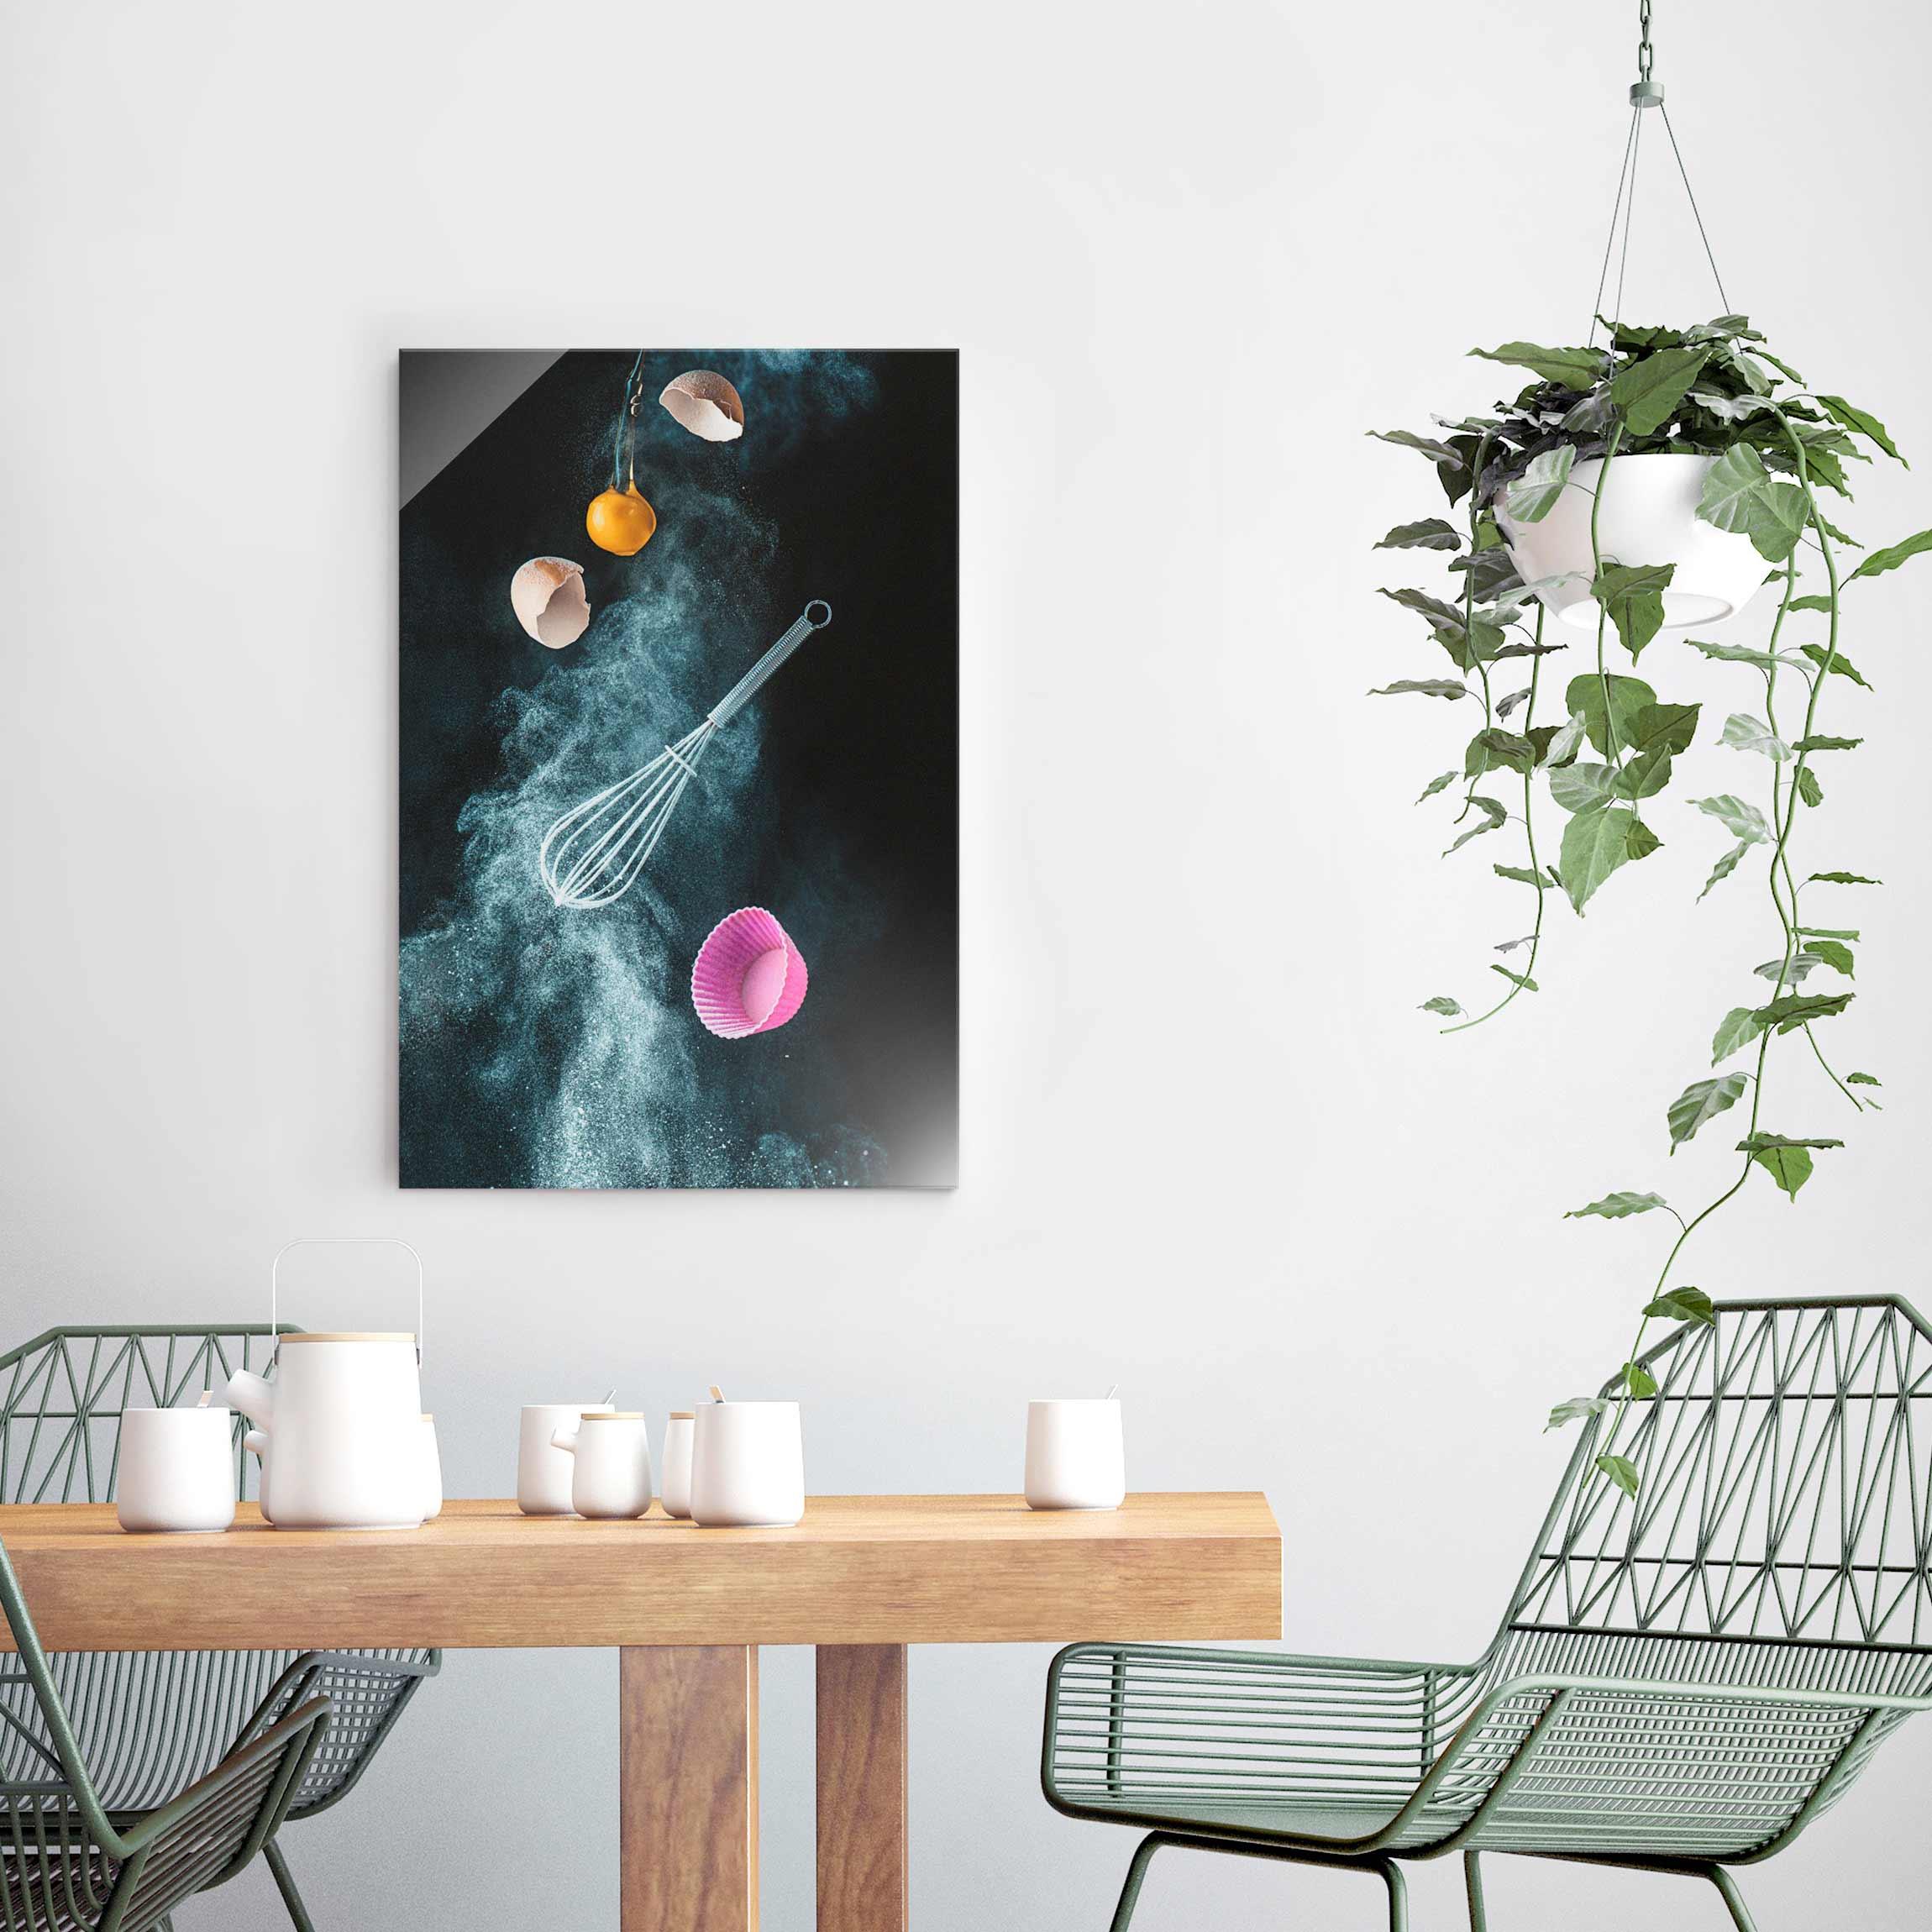 glasbild chaos in der k che hoch 3 2. Black Bedroom Furniture Sets. Home Design Ideas